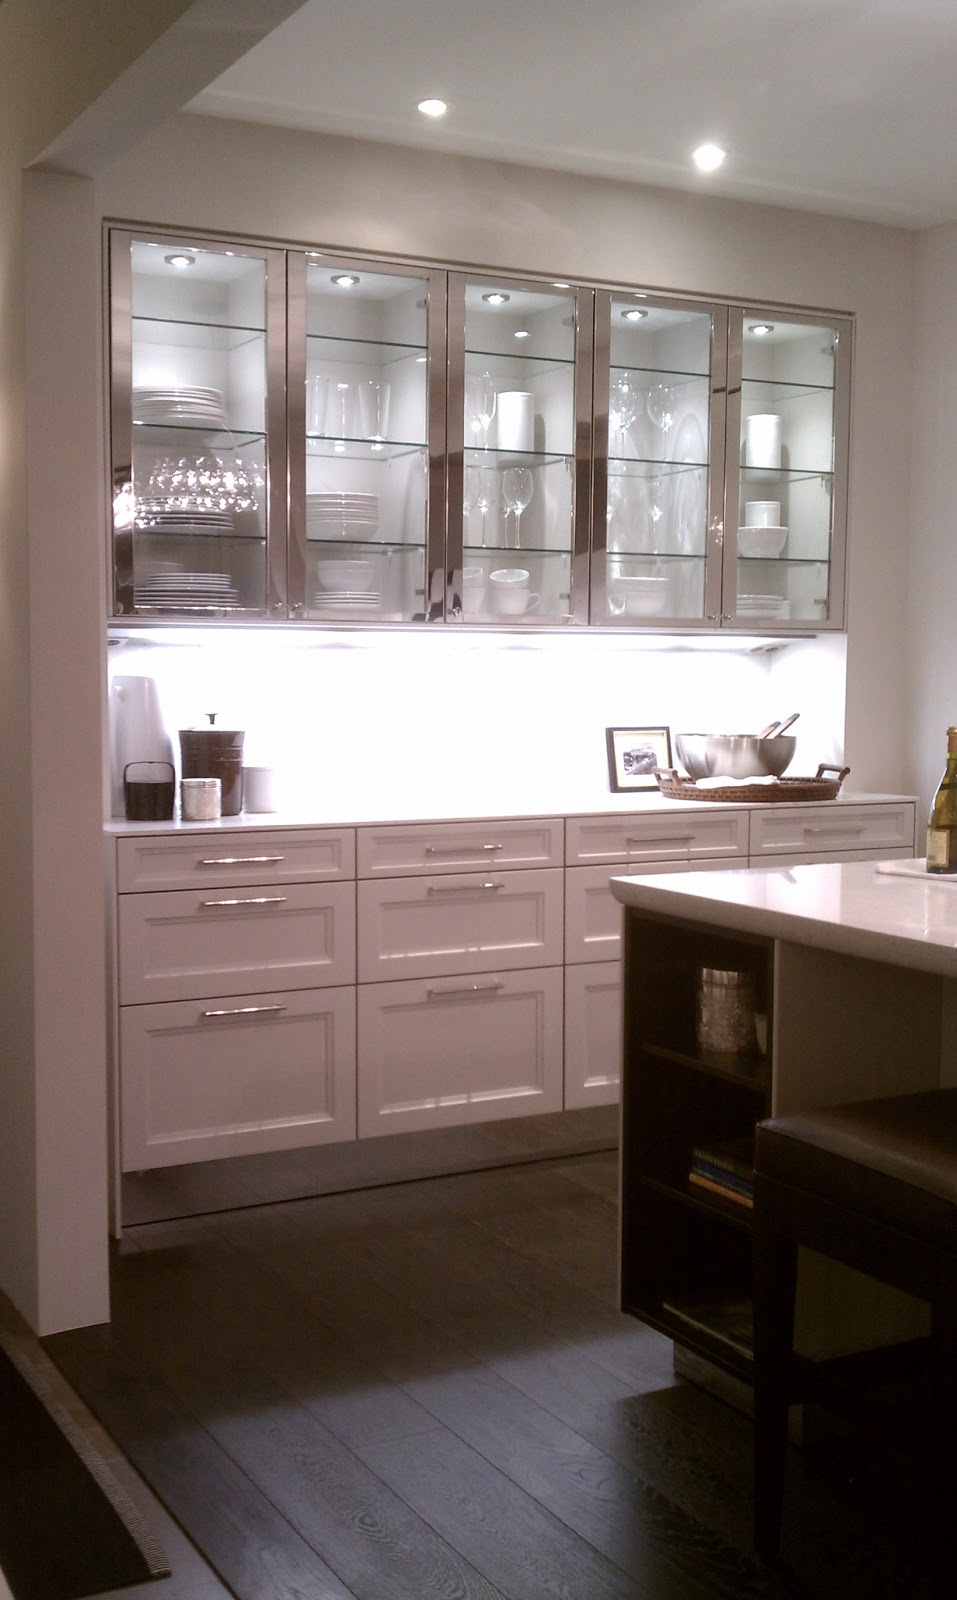 kitchen and interior design siematic. Black Bedroom Furniture Sets. Home Design Ideas